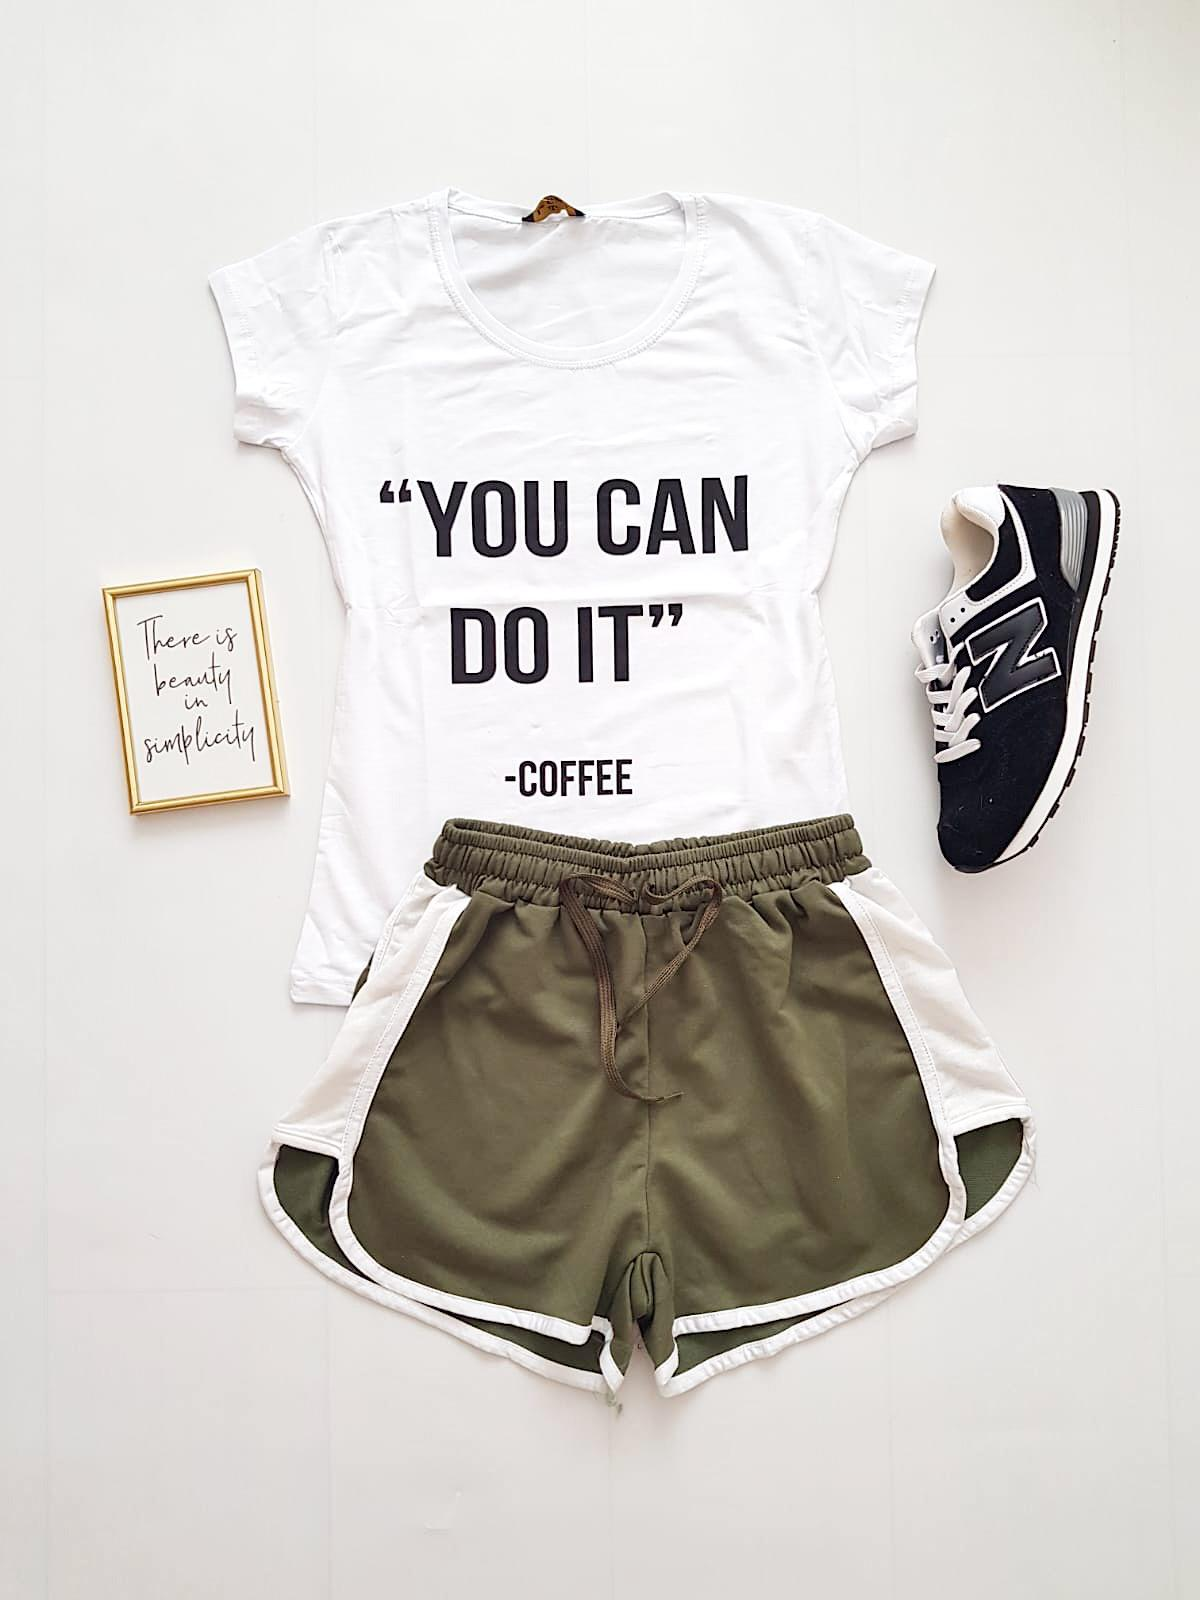 Compleu dama casual COMBO din pantaloni scurti kaki banda + tricou alb You can do it